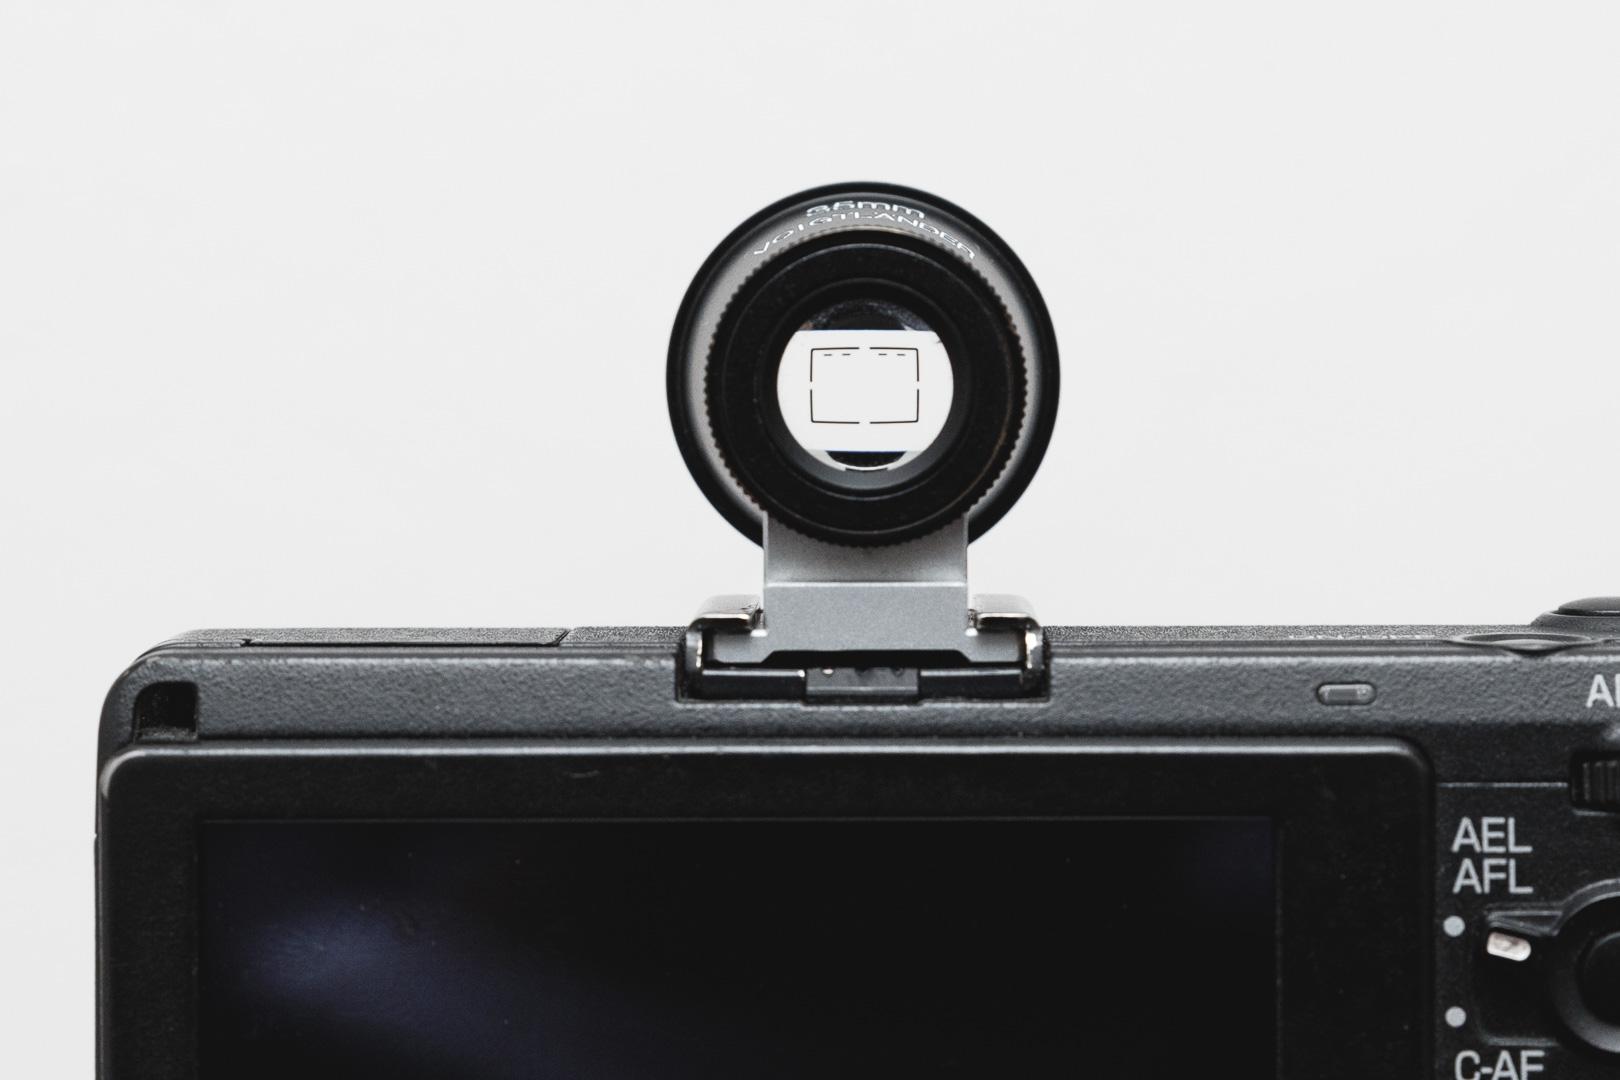 Voigtlander-35mm-Brightline-Finder-Ant Tran-20170402-3019.jpg